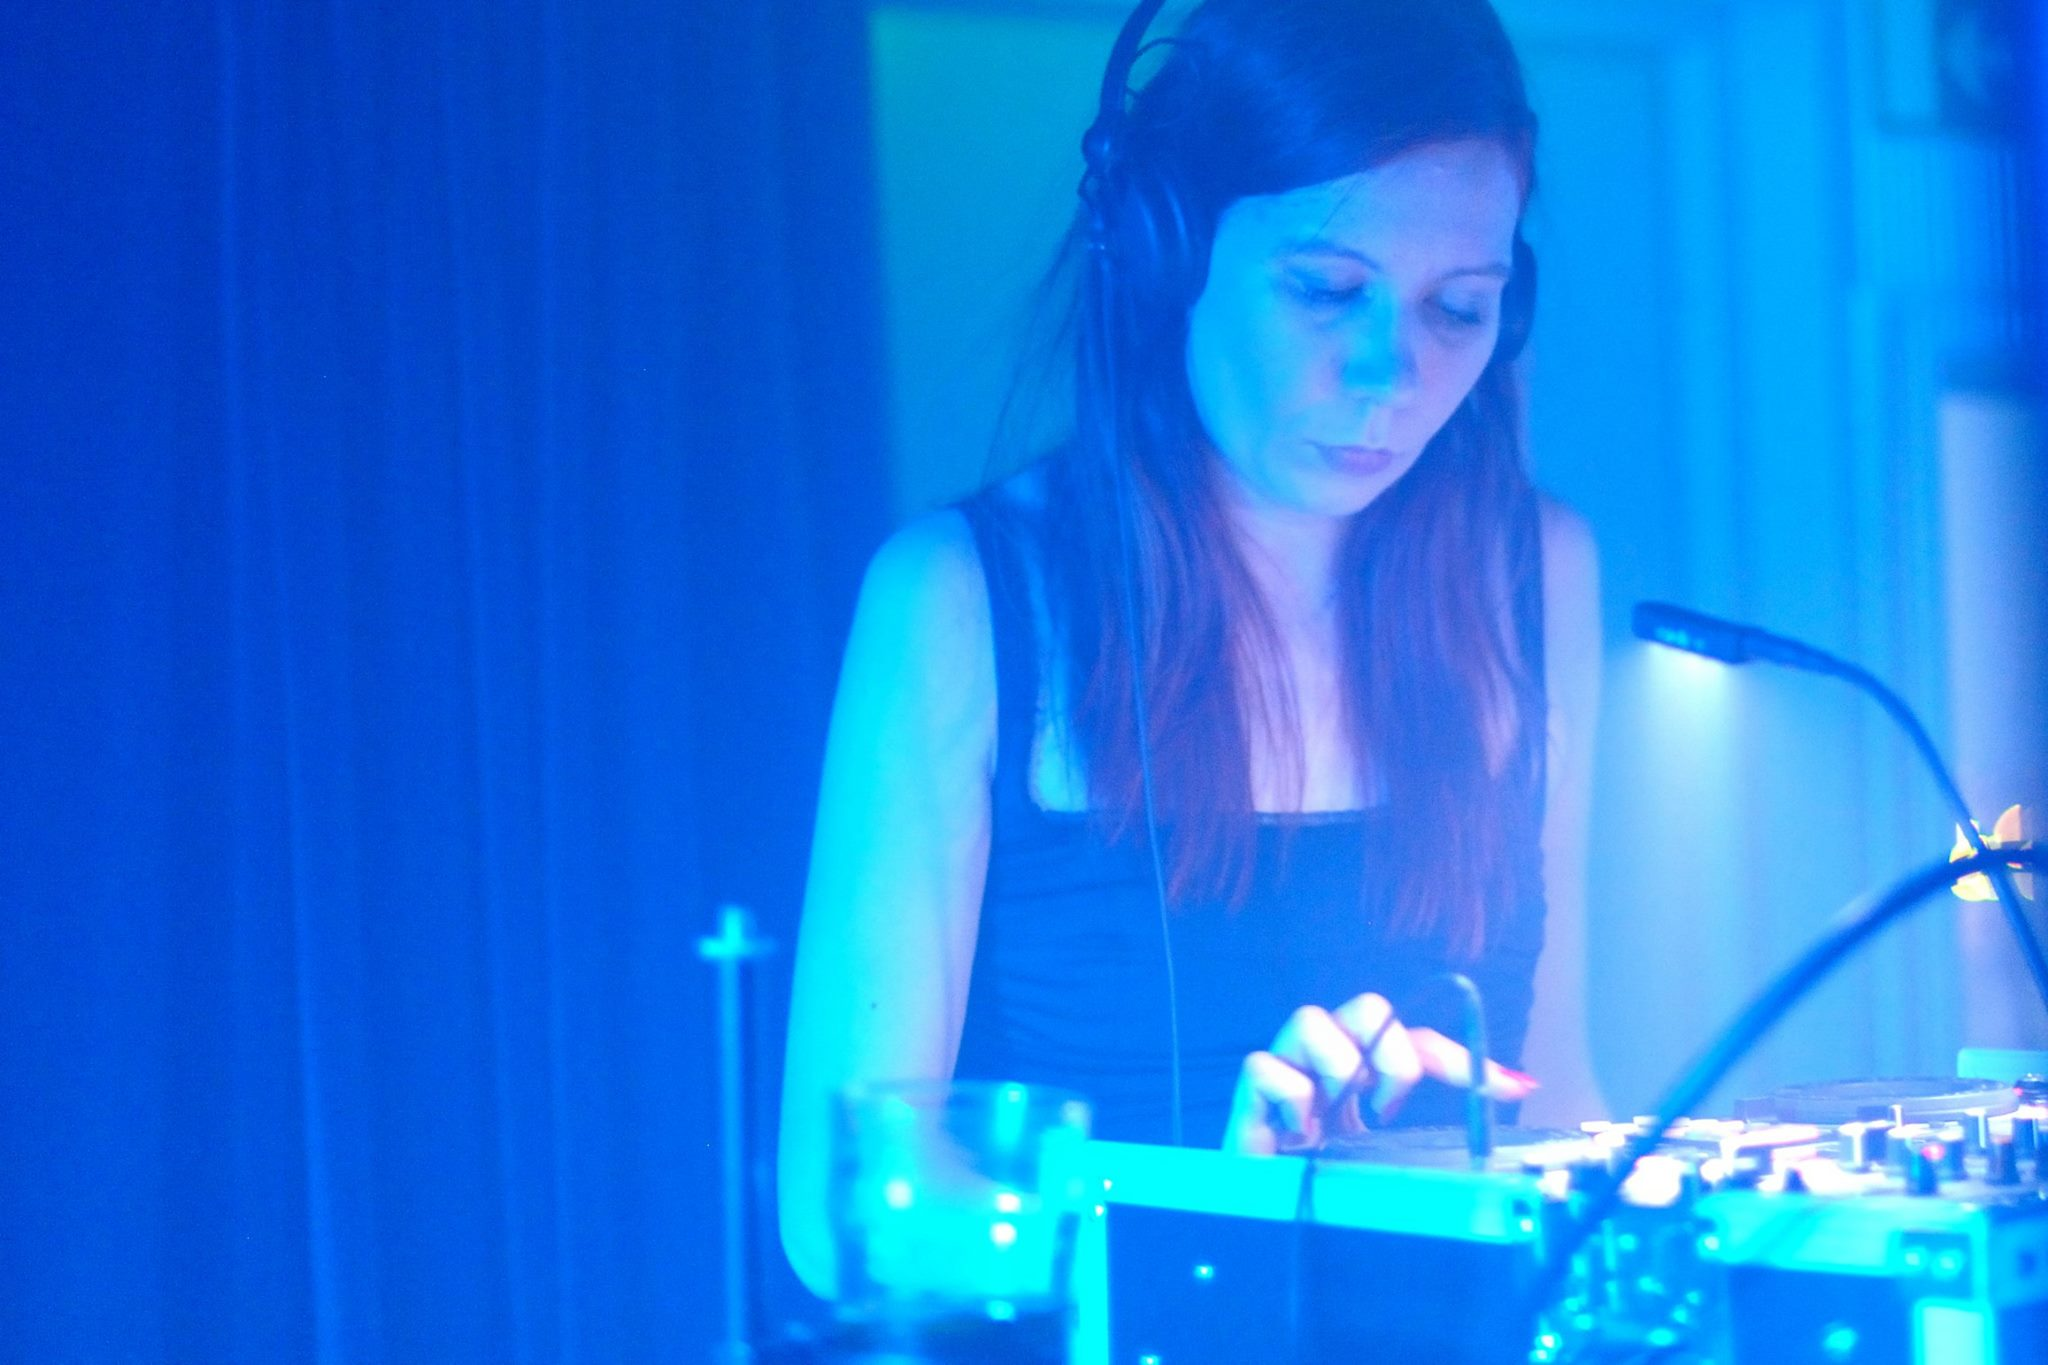 DJ Snowdrop